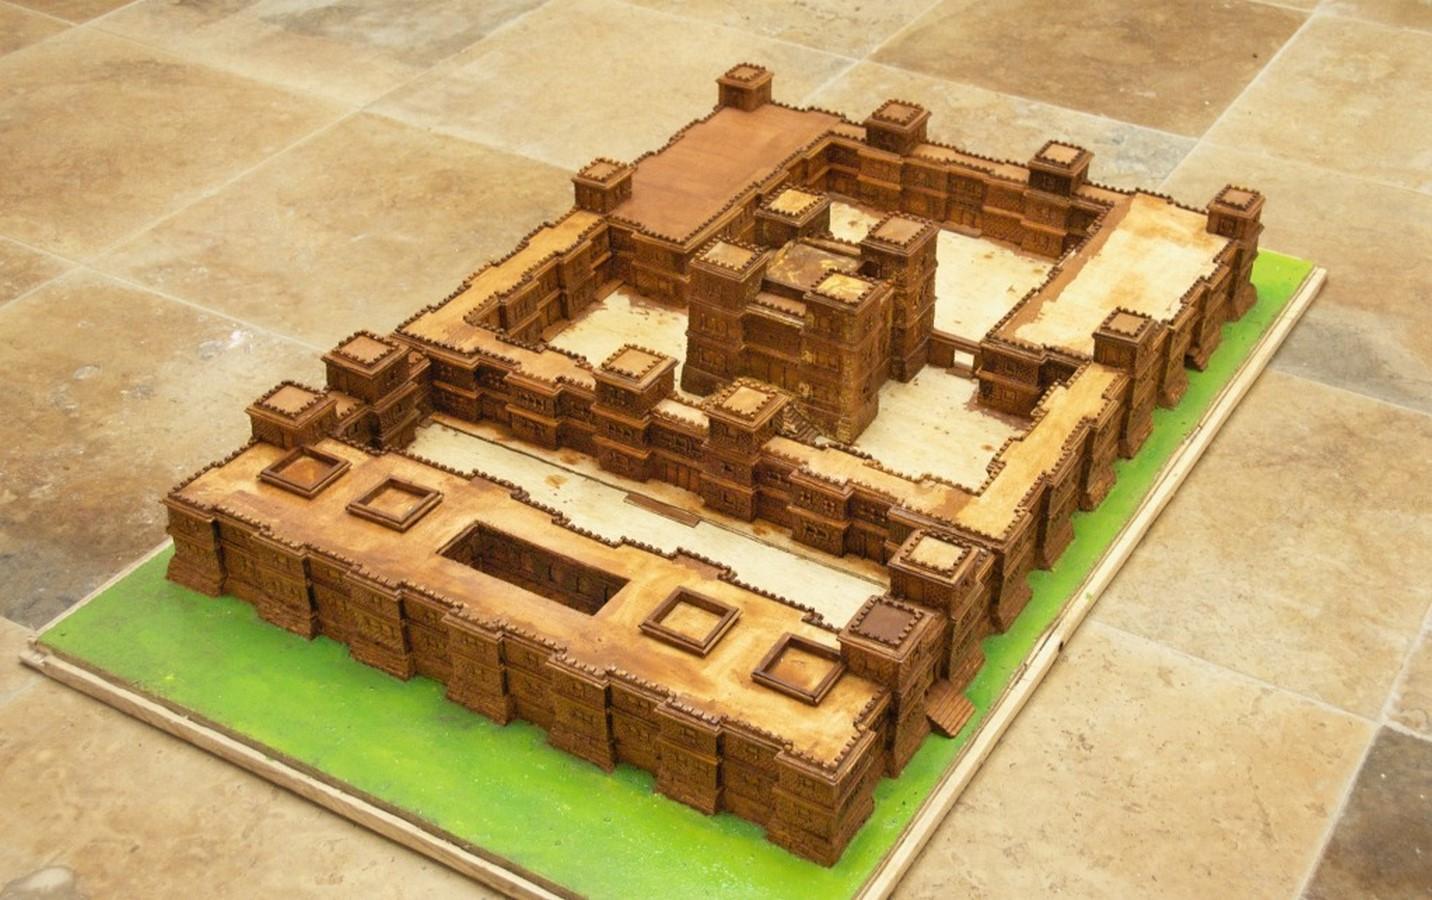 Aksumite architecture: Architecture of Ethiopia - Sheet12